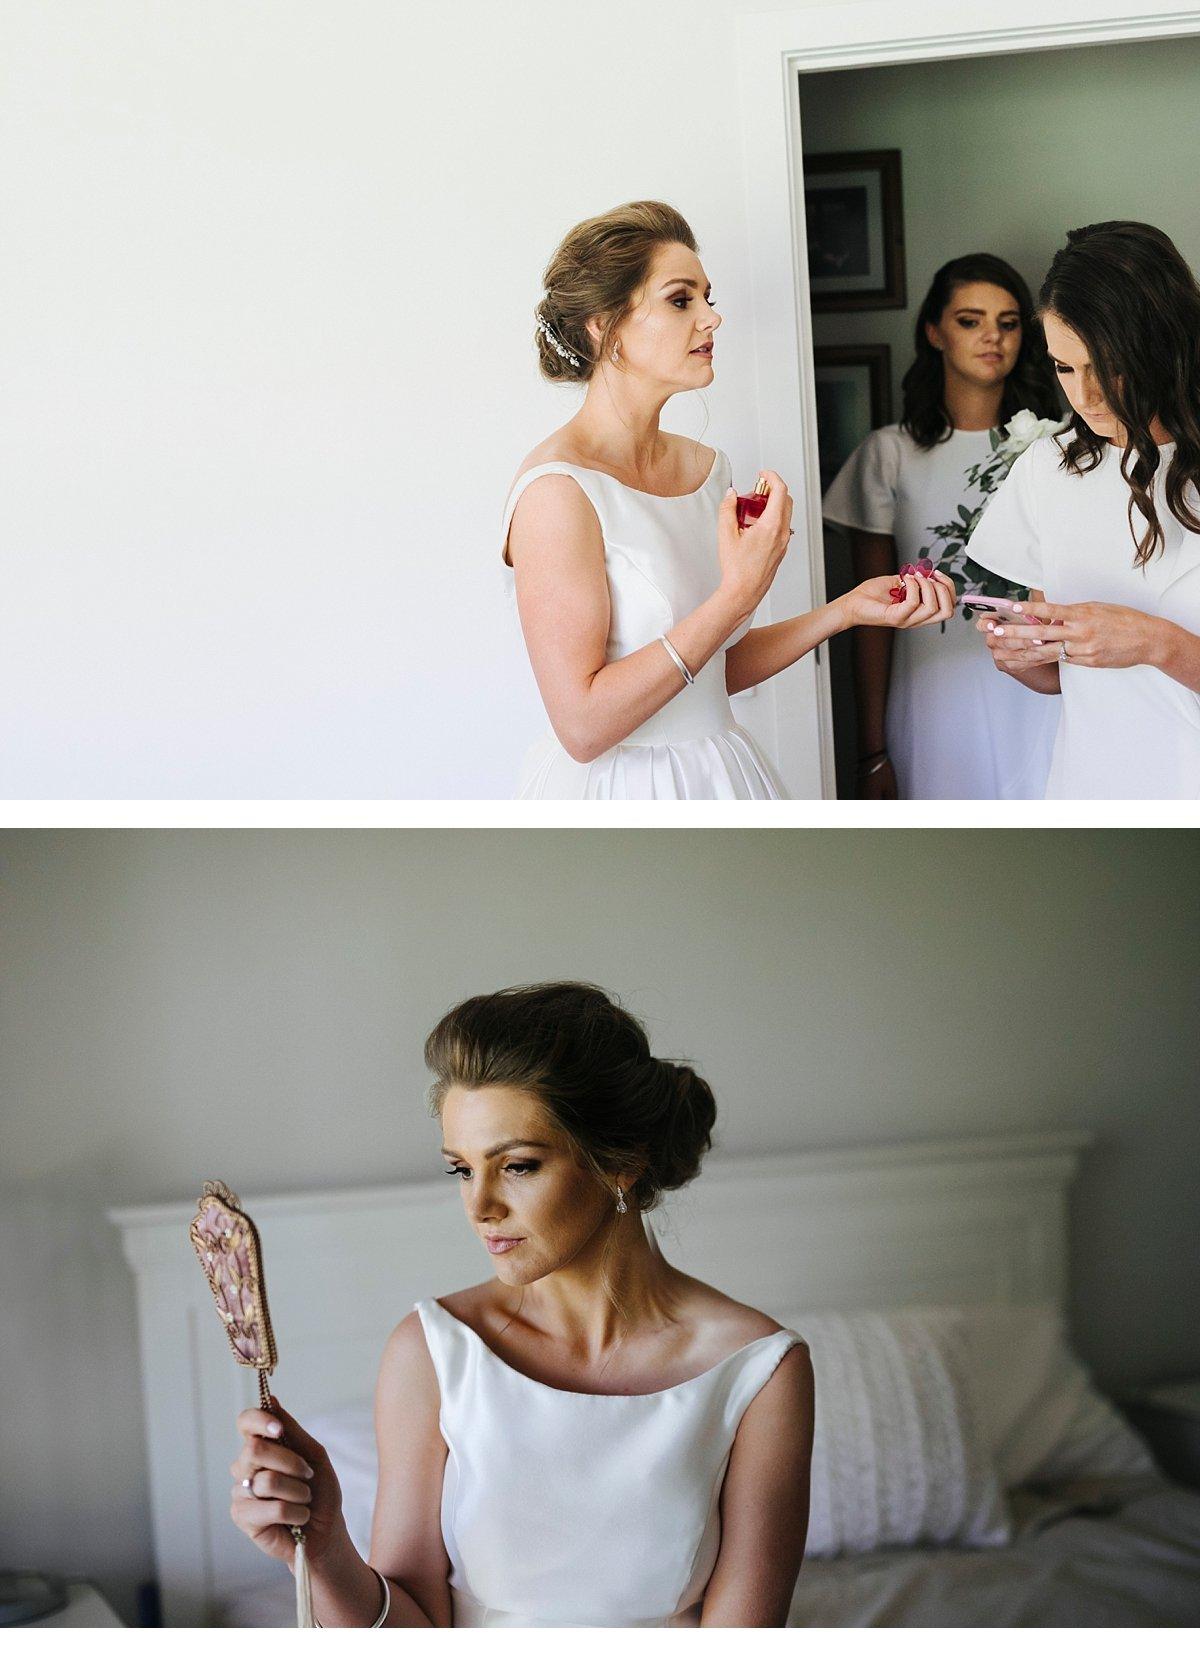 Jerilderie Wedding by Wagga Wagga Wedding Photographer Peppermint Studios_Deniliquin weddings_0115